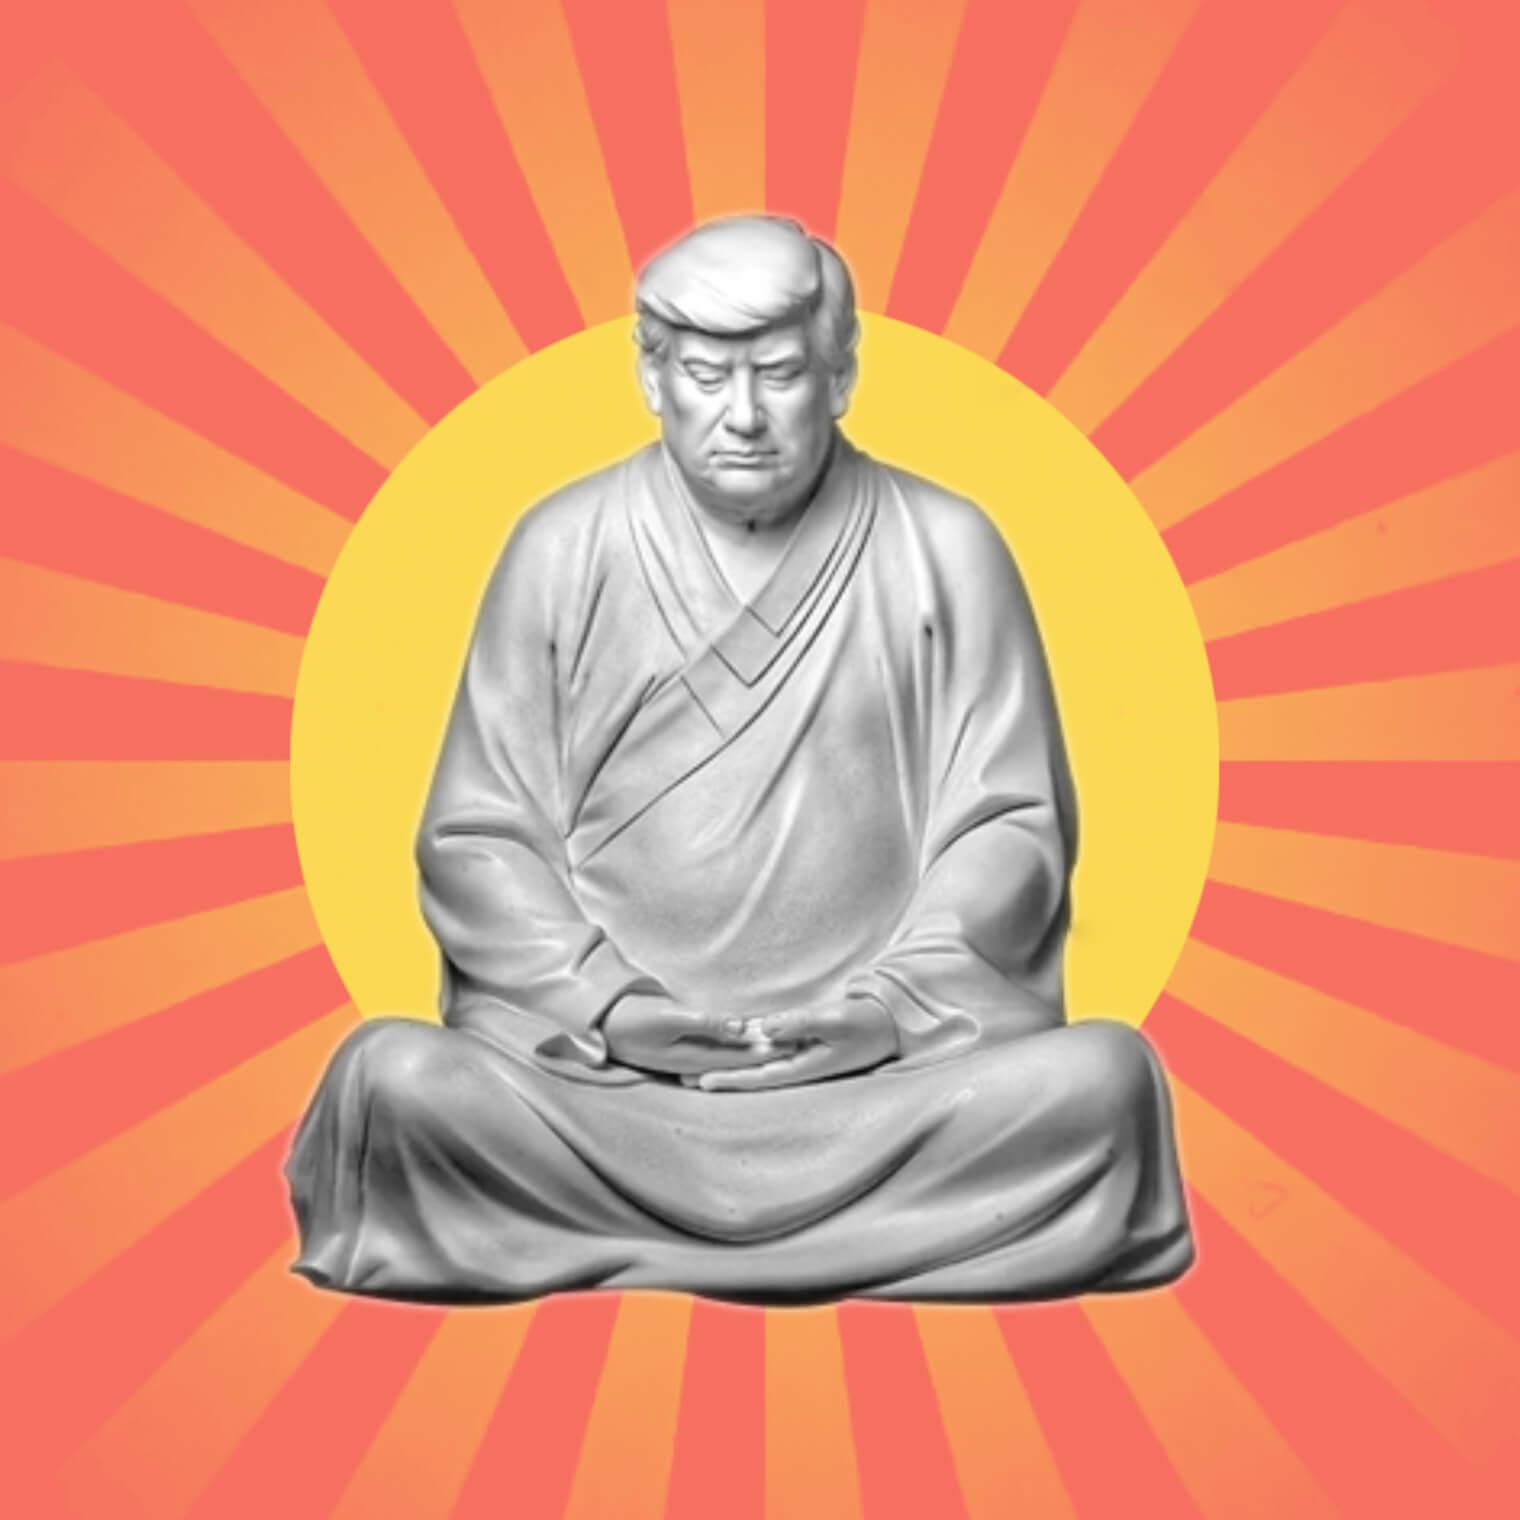 sunset-buddha-edit-comjpg